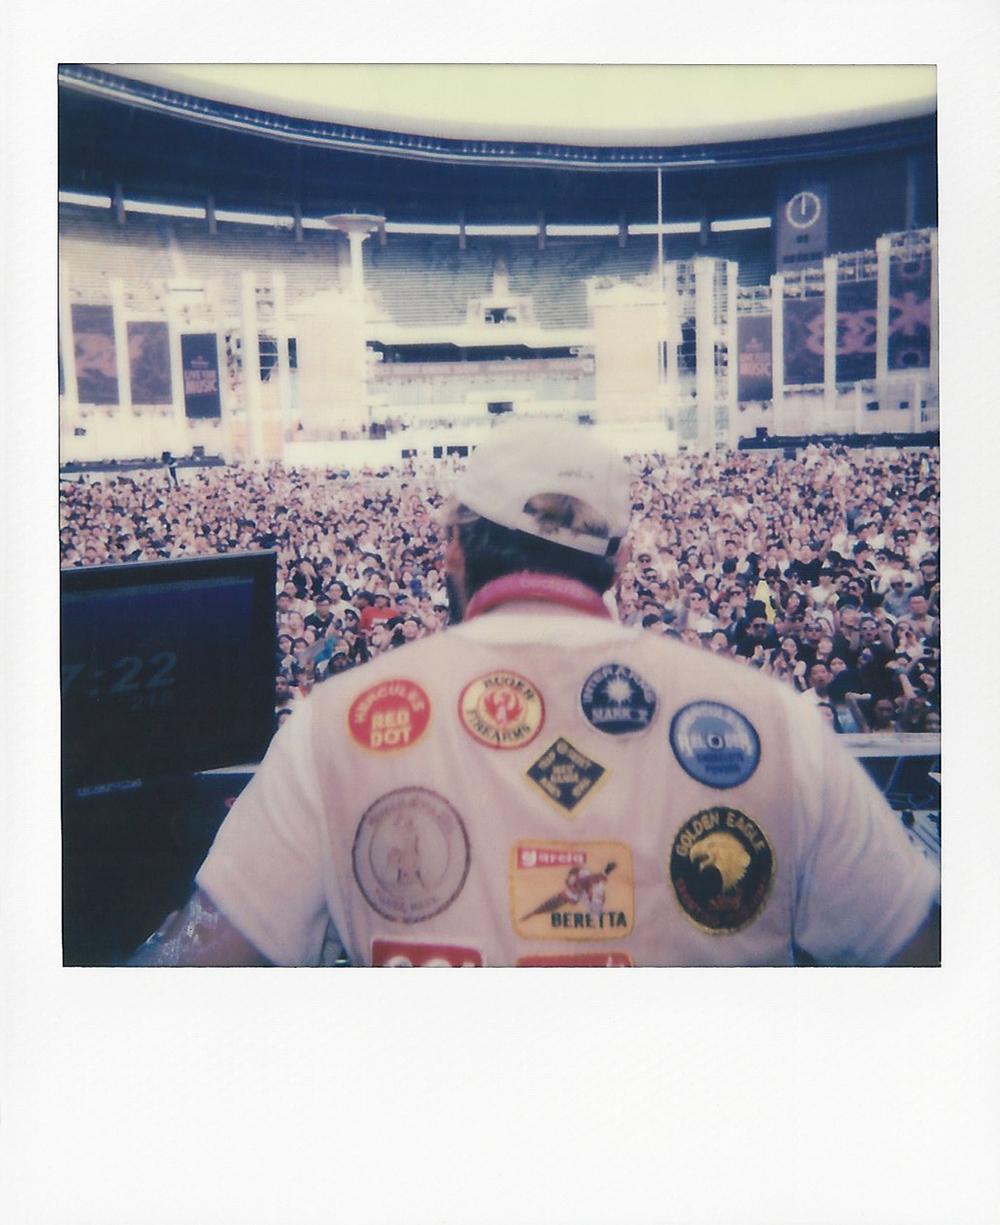 Abe-Korea-1-Polaroid-casenruiz.jpg